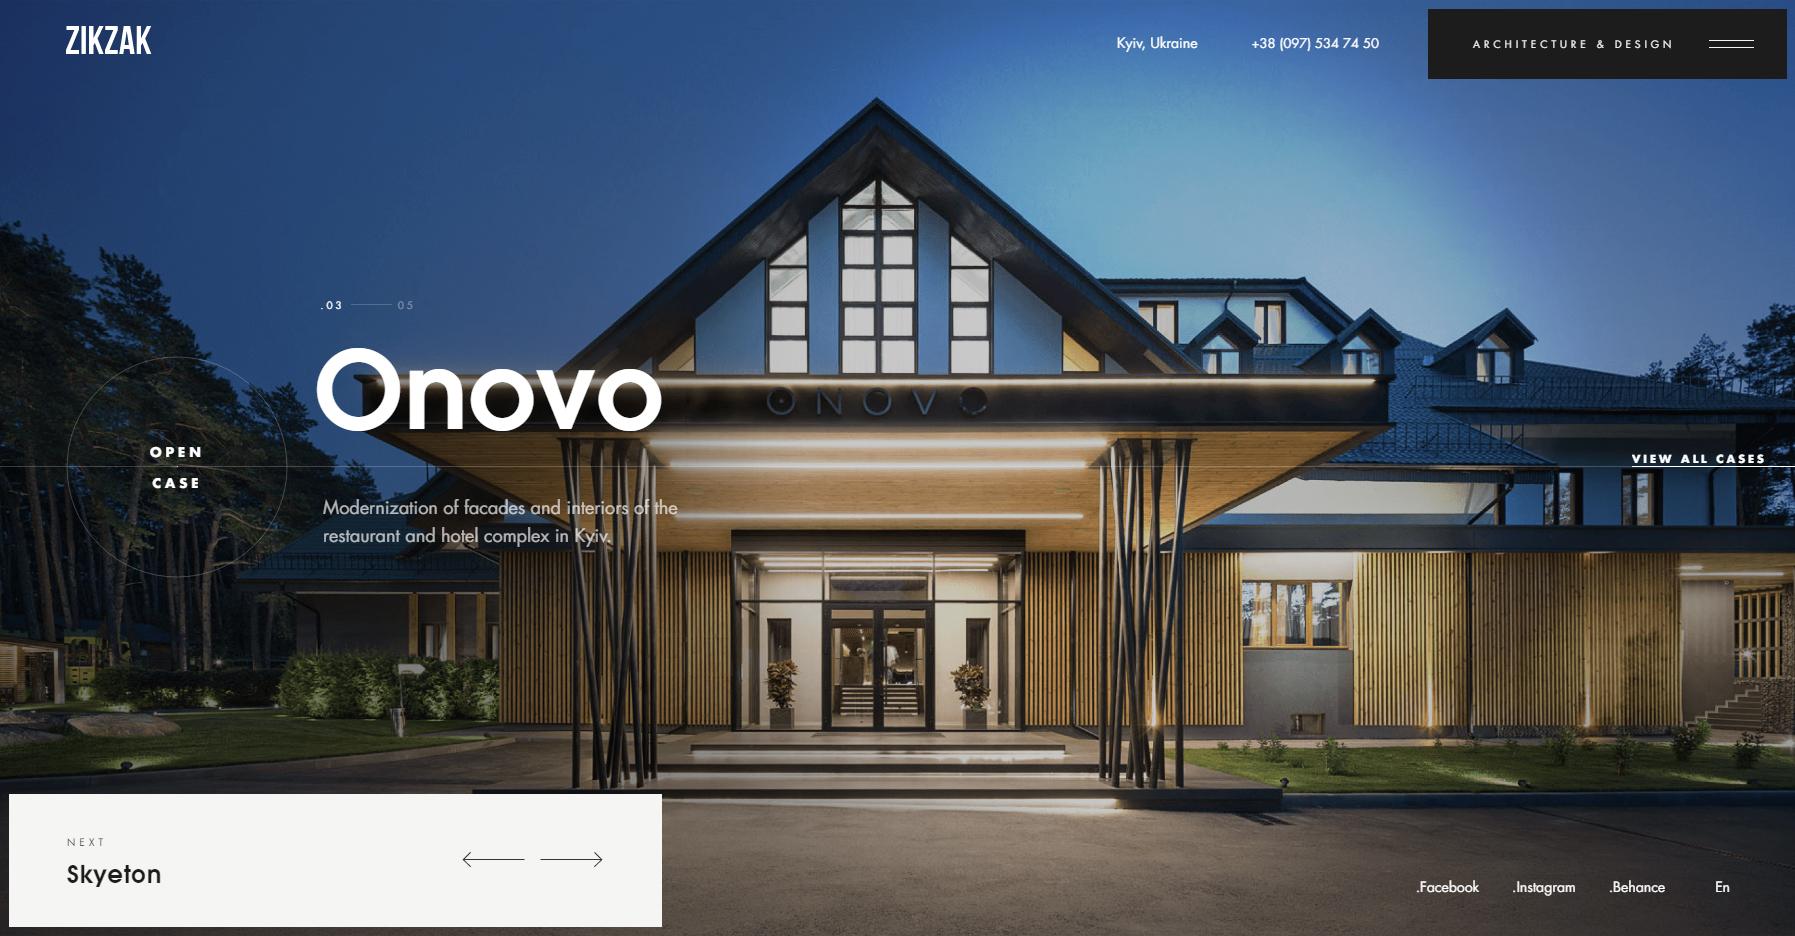 ZIKZAK - Website of the Day